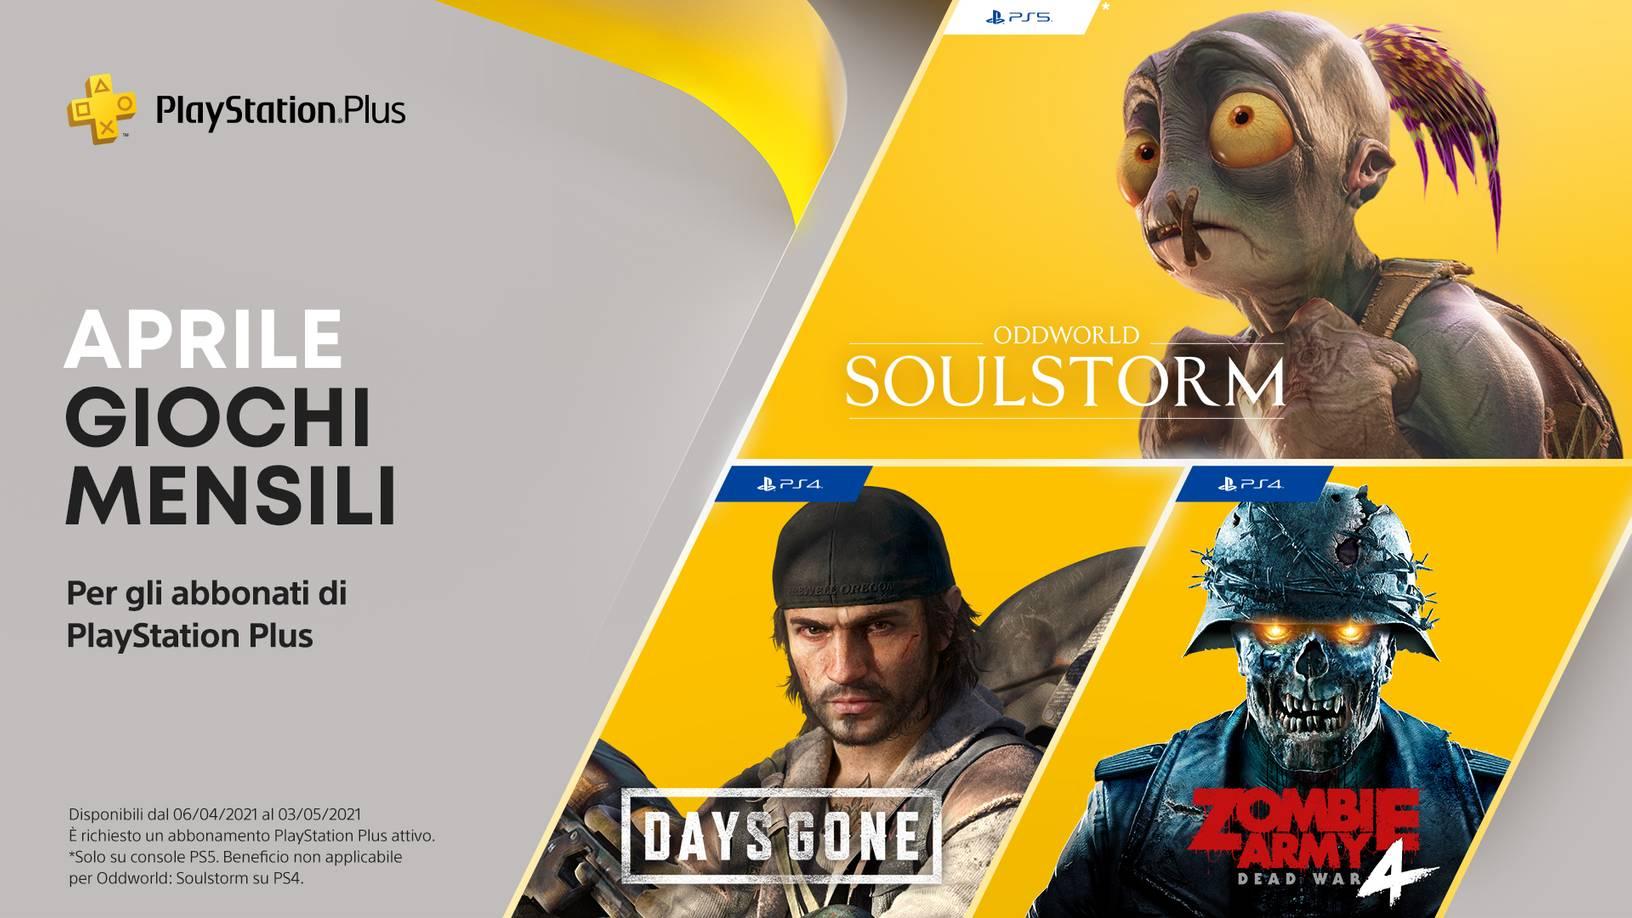 PlayStation Plus Aprile 2021 : Days Gone, Oddworld: Soulstorm e Zombie Army 4: Dead War